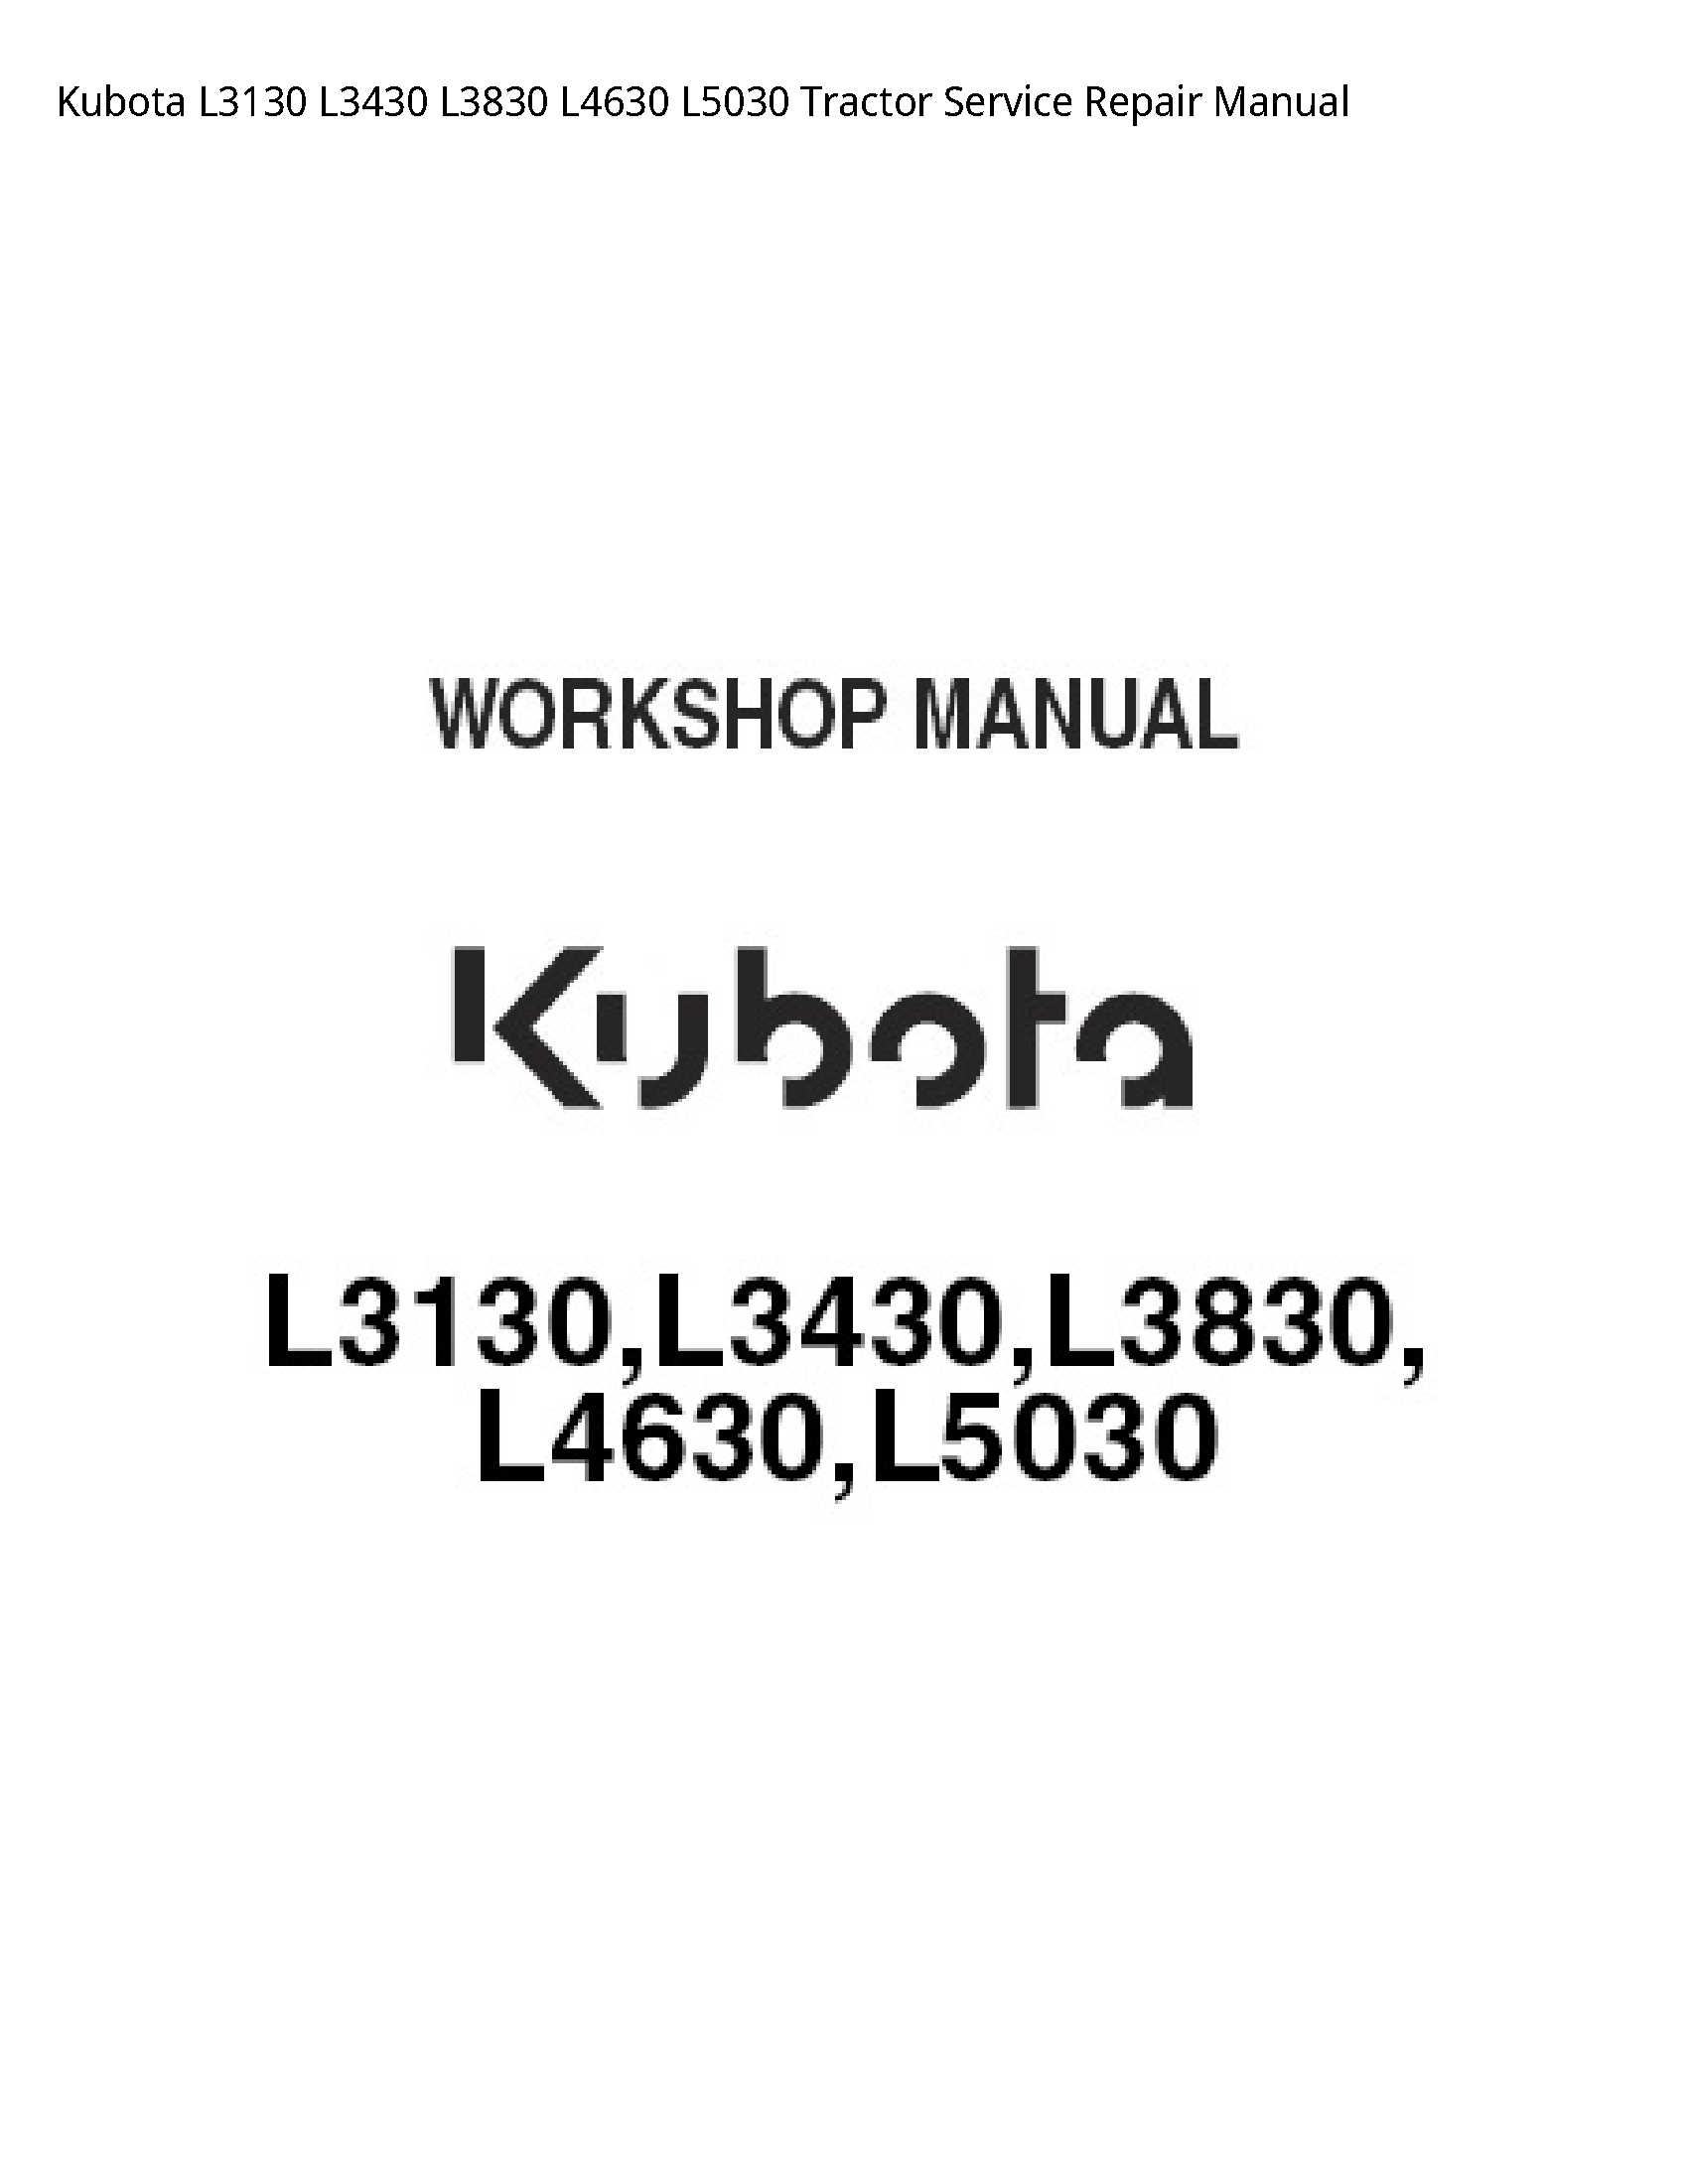 Kubota L3130 Tractor manual